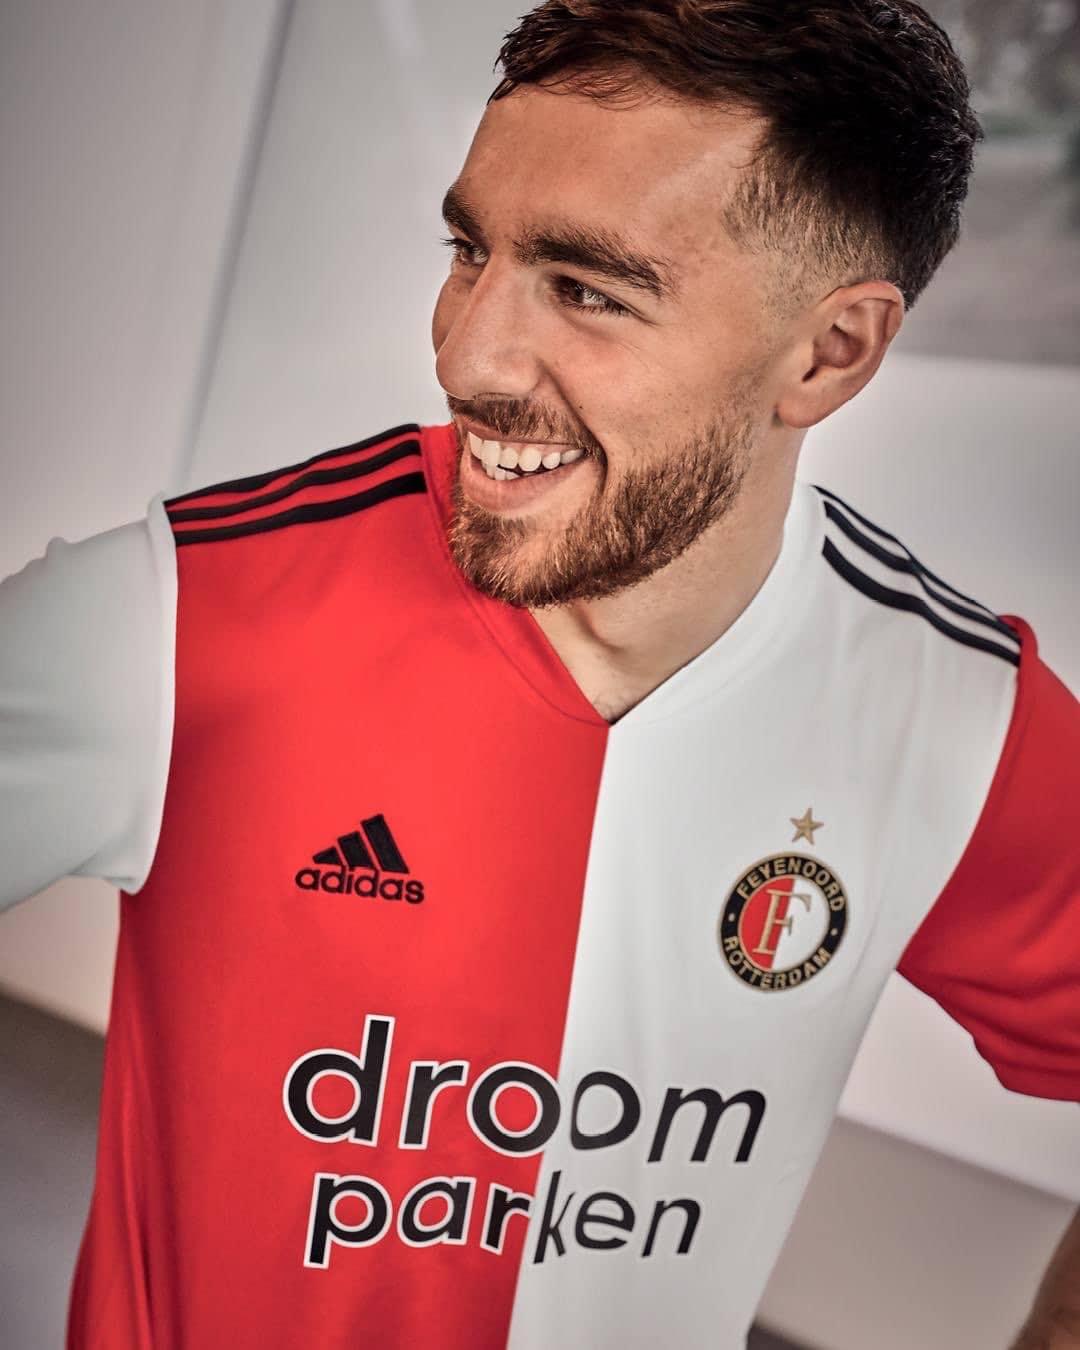 Feyenoord 2020 21 Adidas Home Kit The Kitman